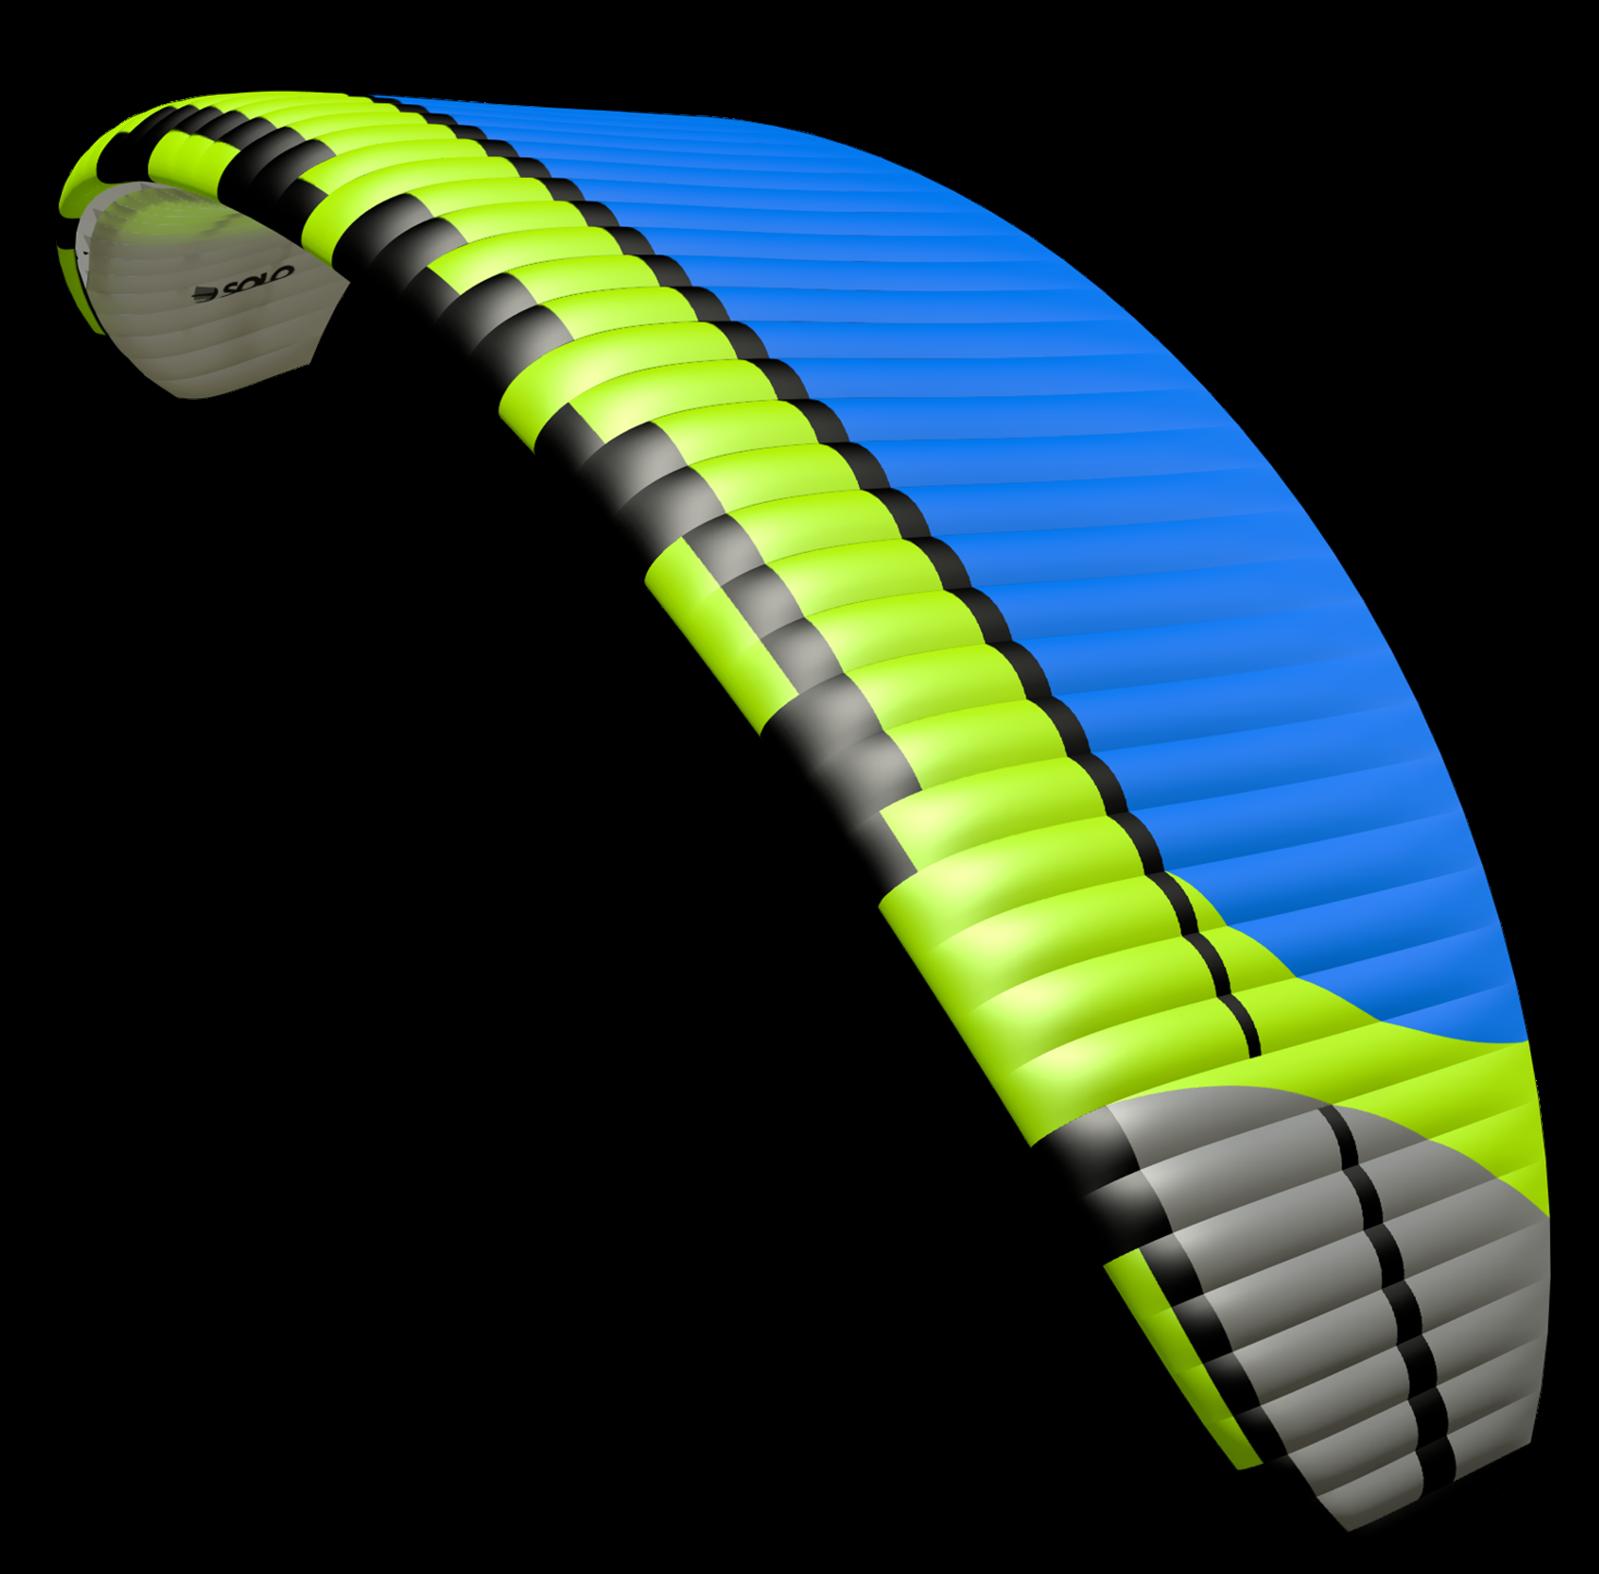 Dudek Solo Paramotor Wing